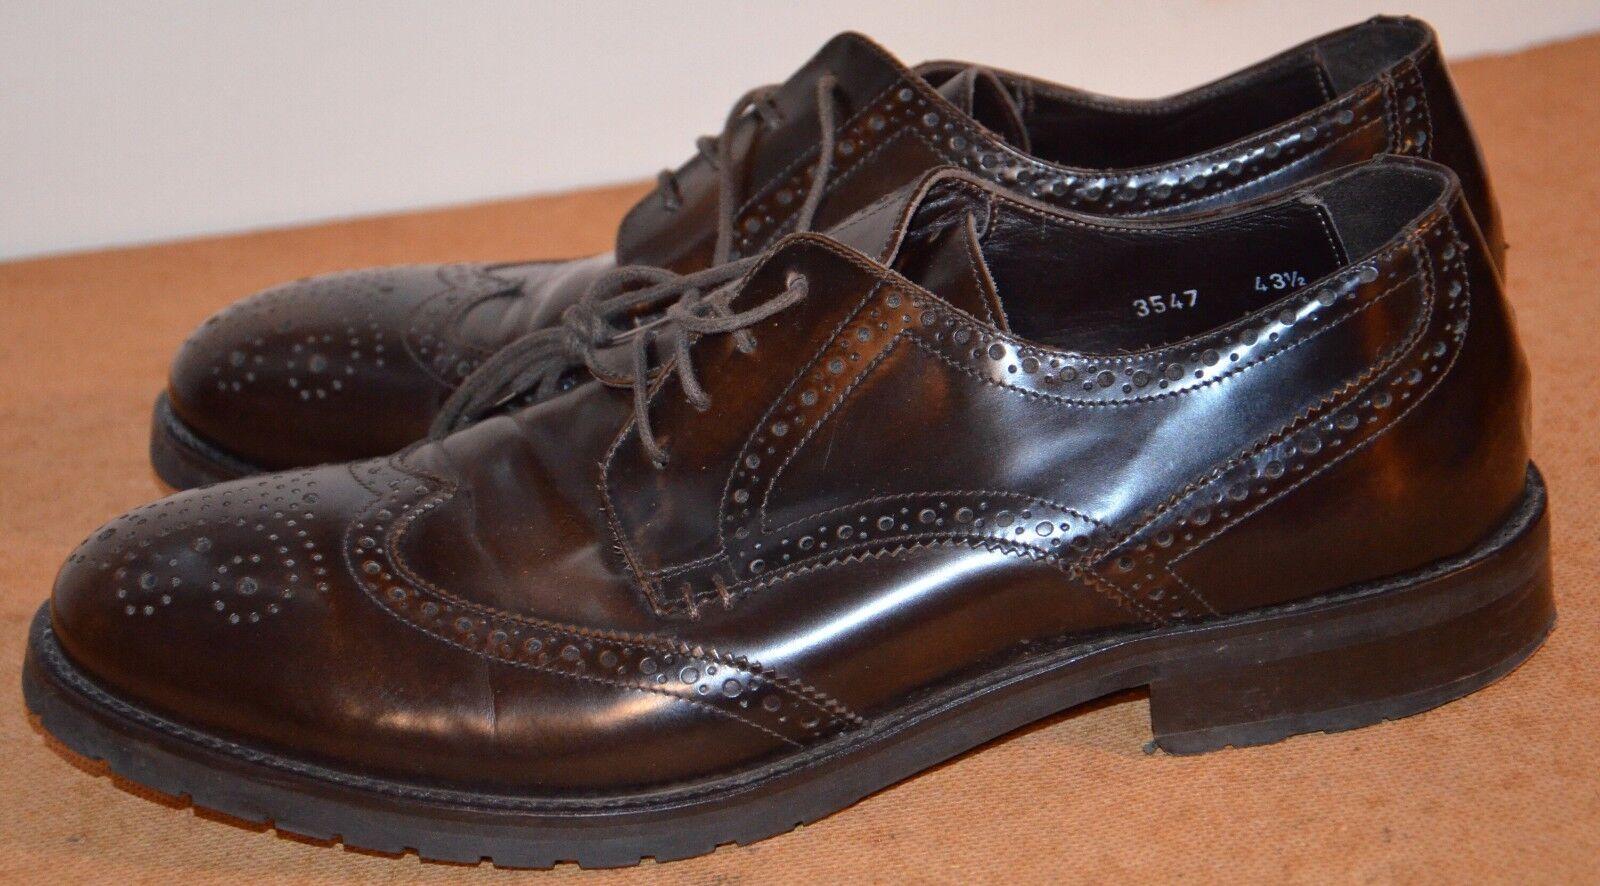 KONSTANTIN STARKE neu york Herren Schuhe Leder Anzug Gr  43,5 Made in Italy